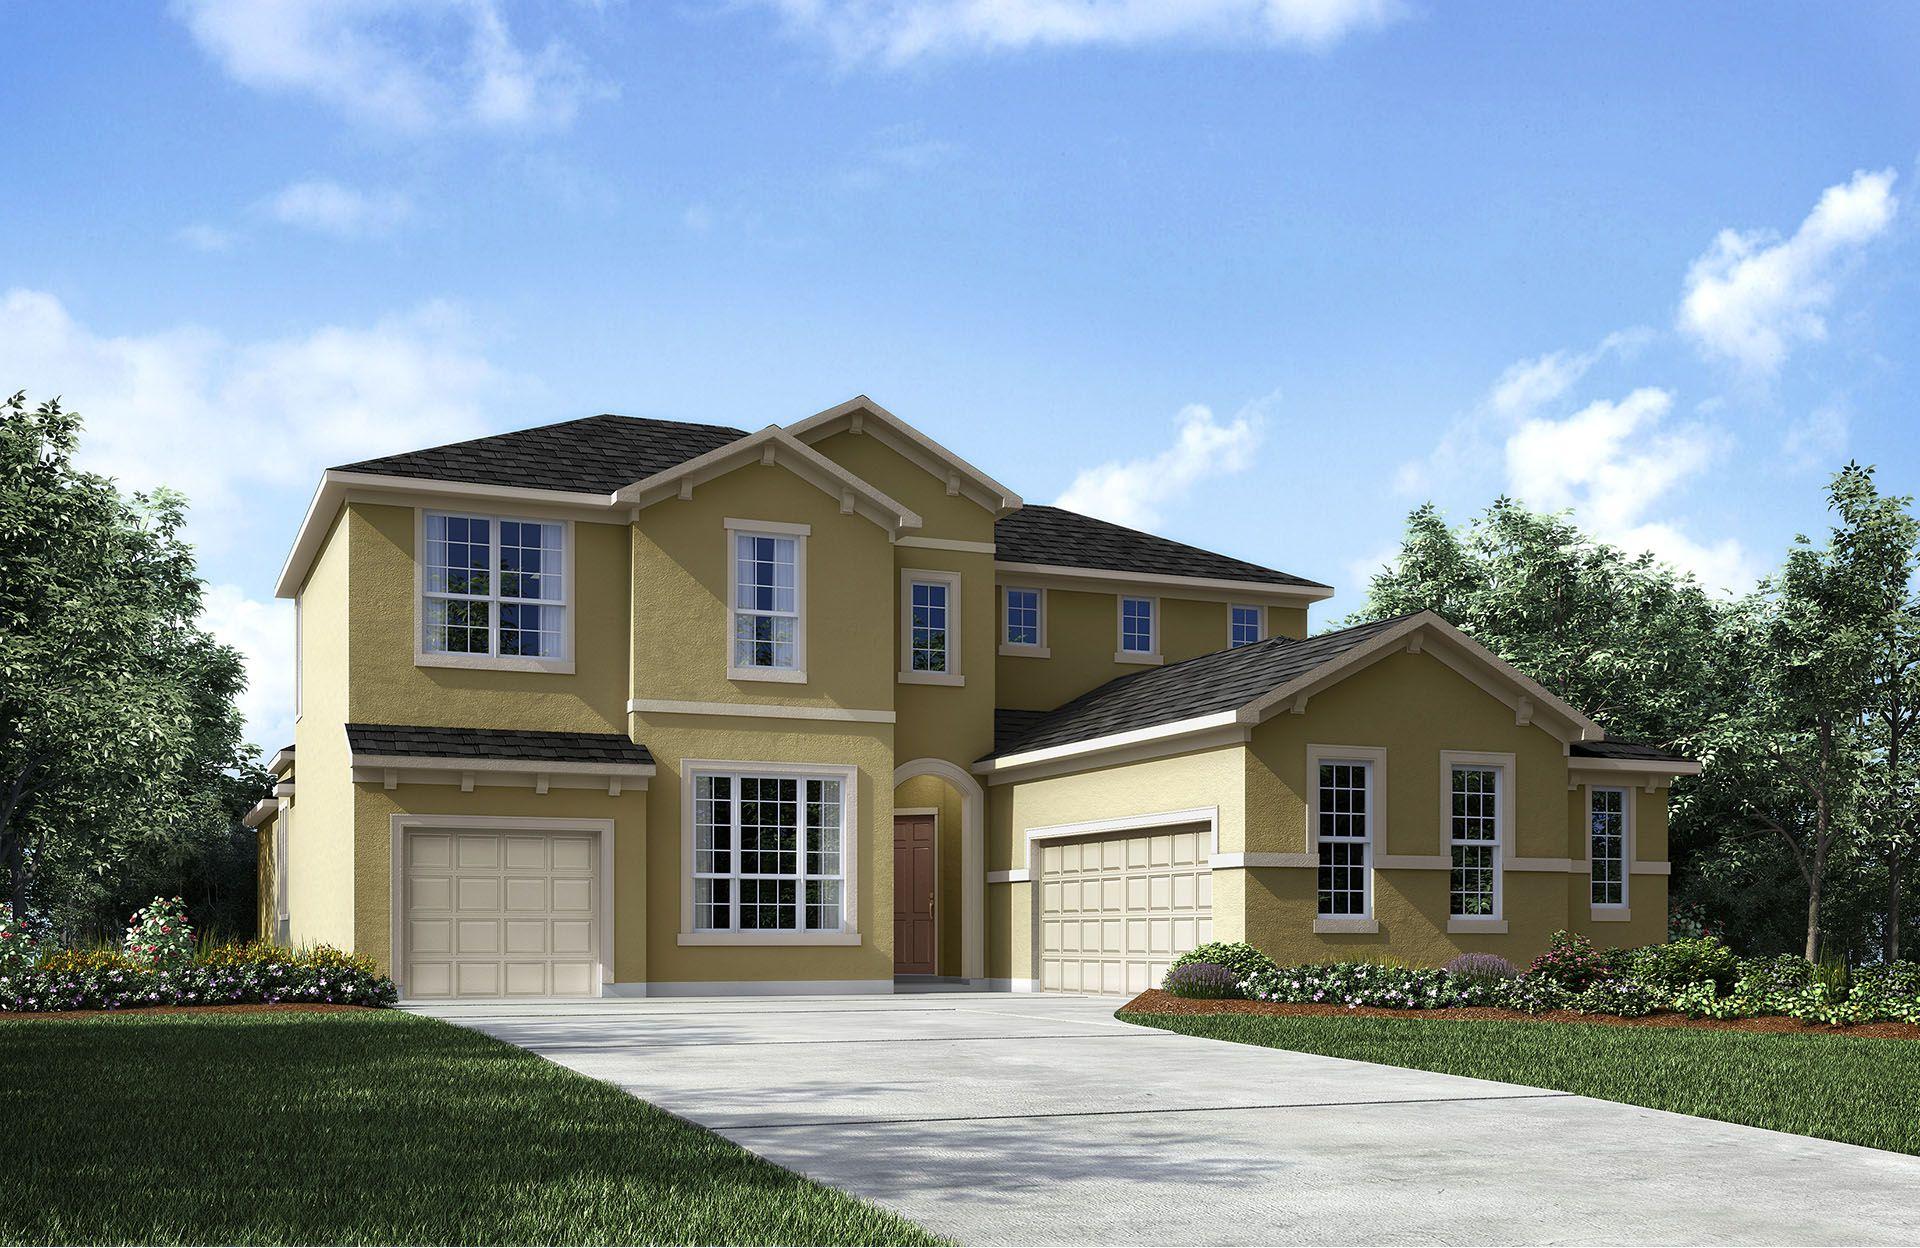 1365 Coopers Hawk Way, Middleburg, FL Homes & Land - Real Estate